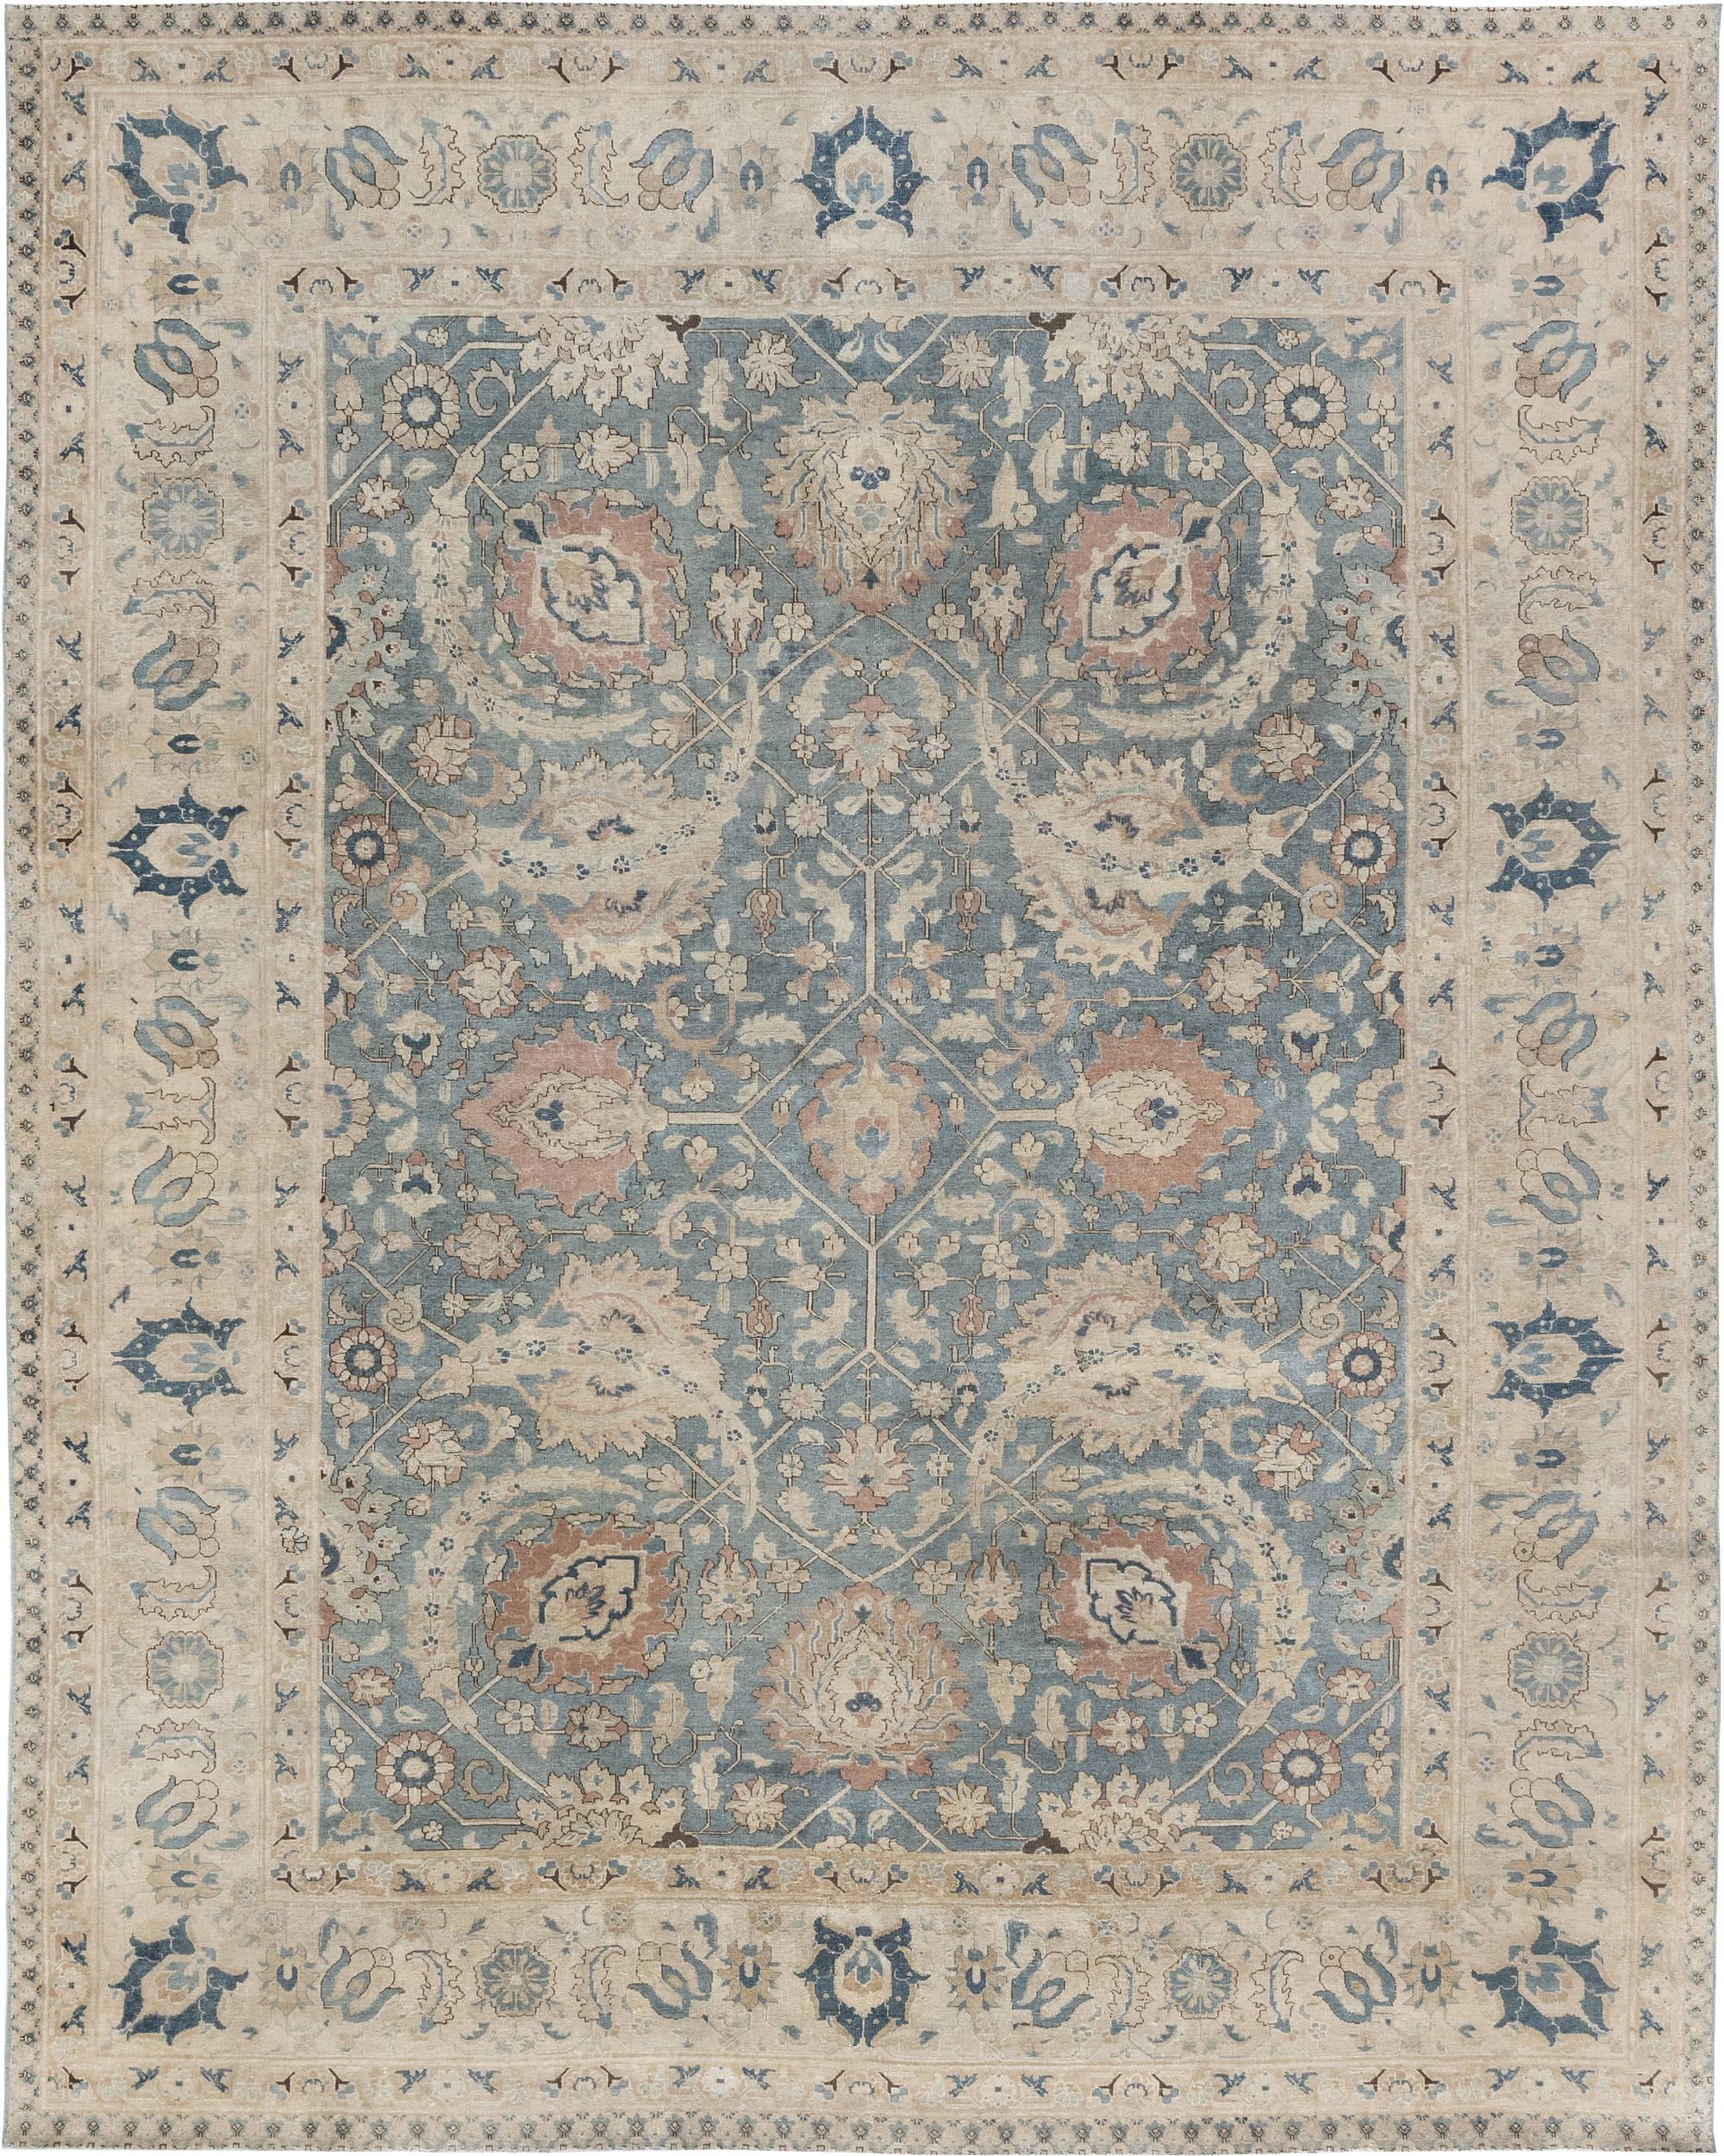 Antique Persian Tabriz Rug BB6896